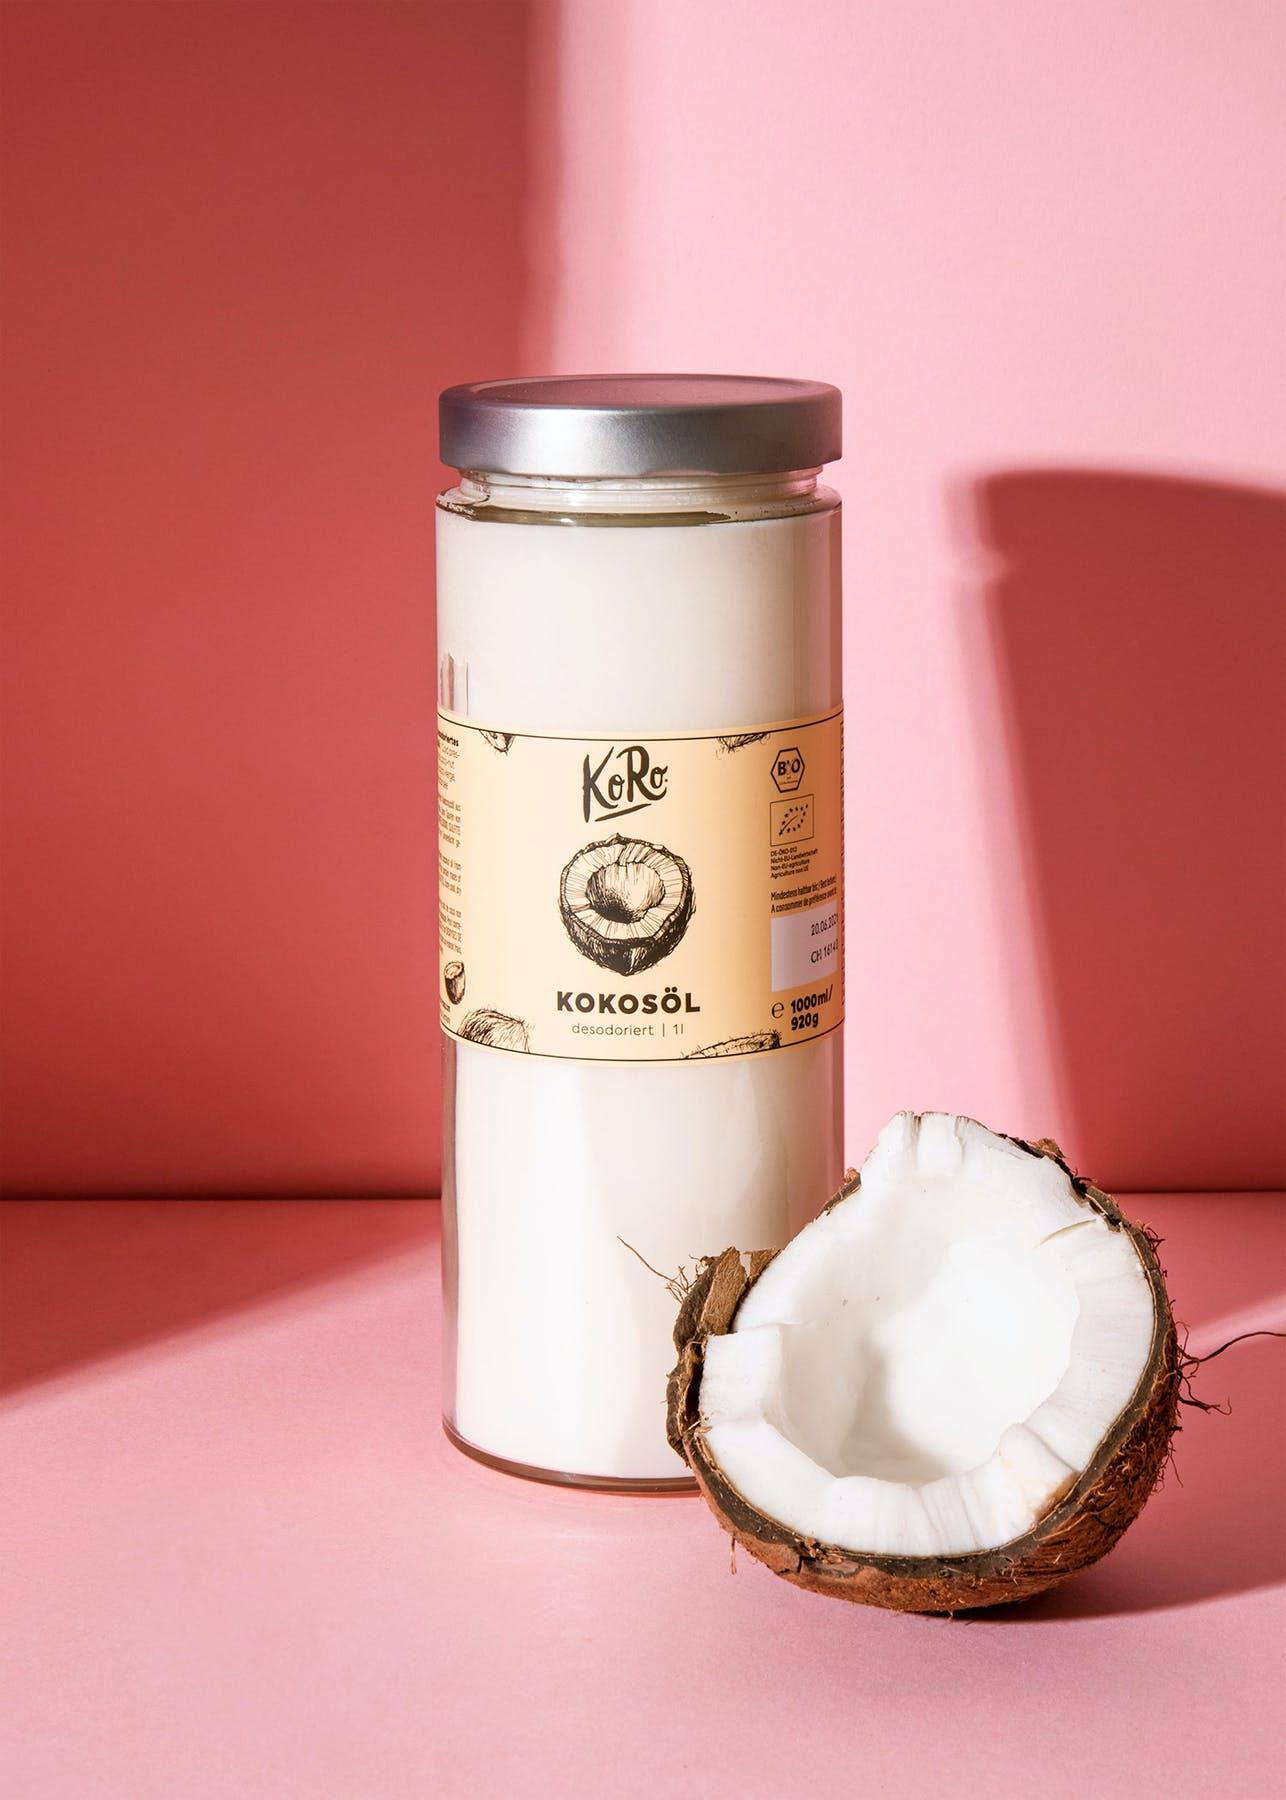 https://reveengrand.com/wp-content/uploads/2021/02/Recette-granola-cups-huile-de-coco-koro.fr_.jpg